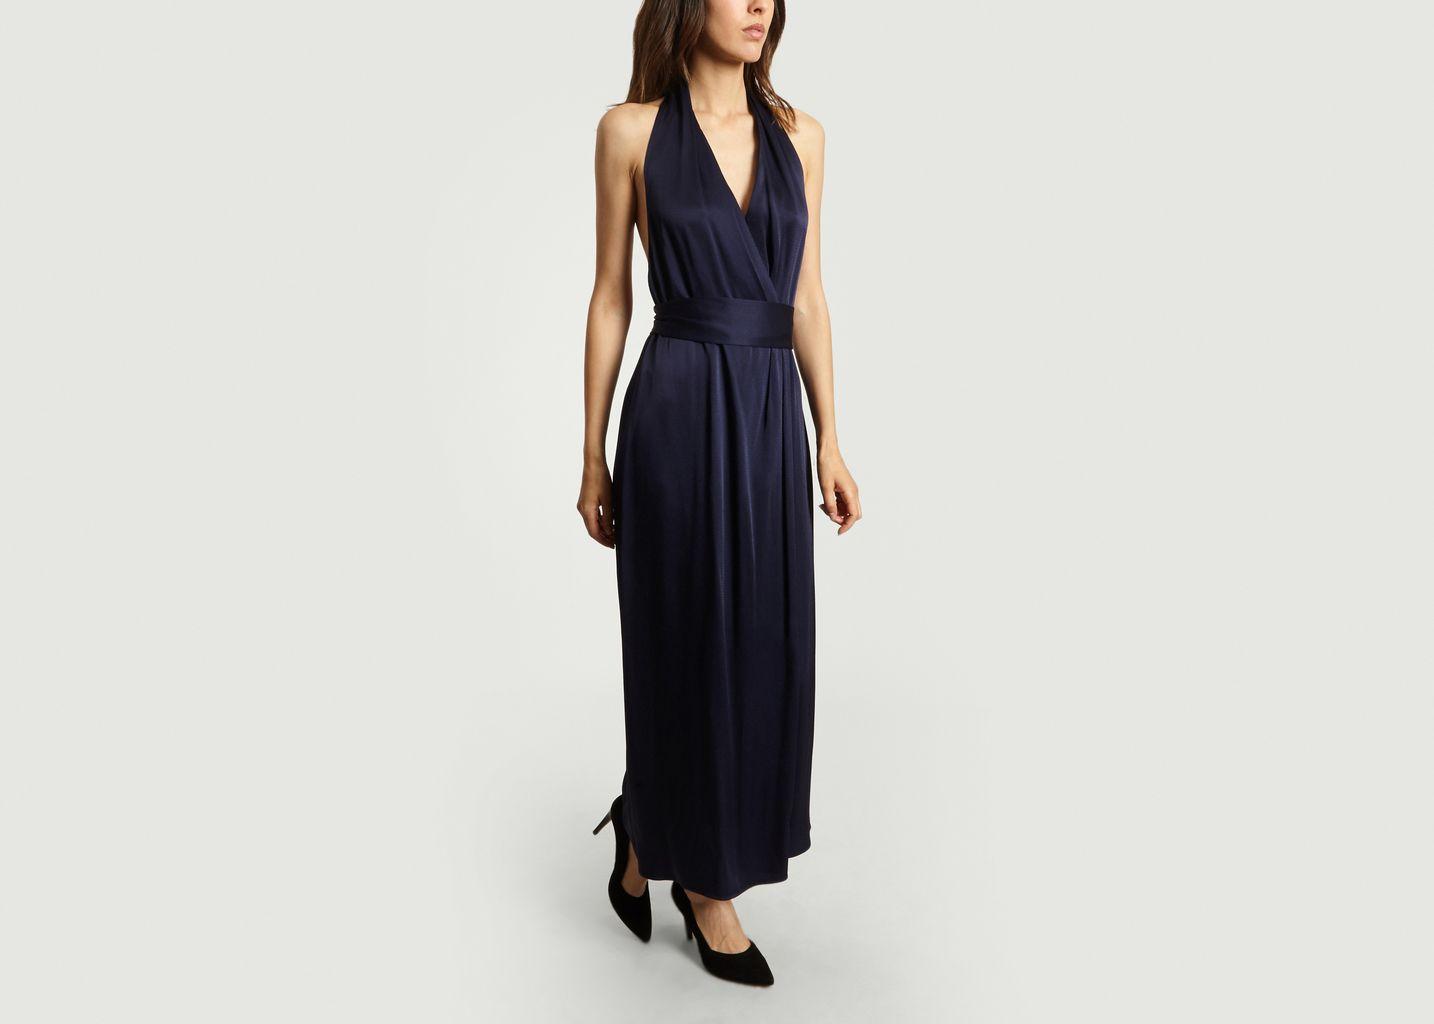 Scoop Back Maxi Dress - Tara Jarmon